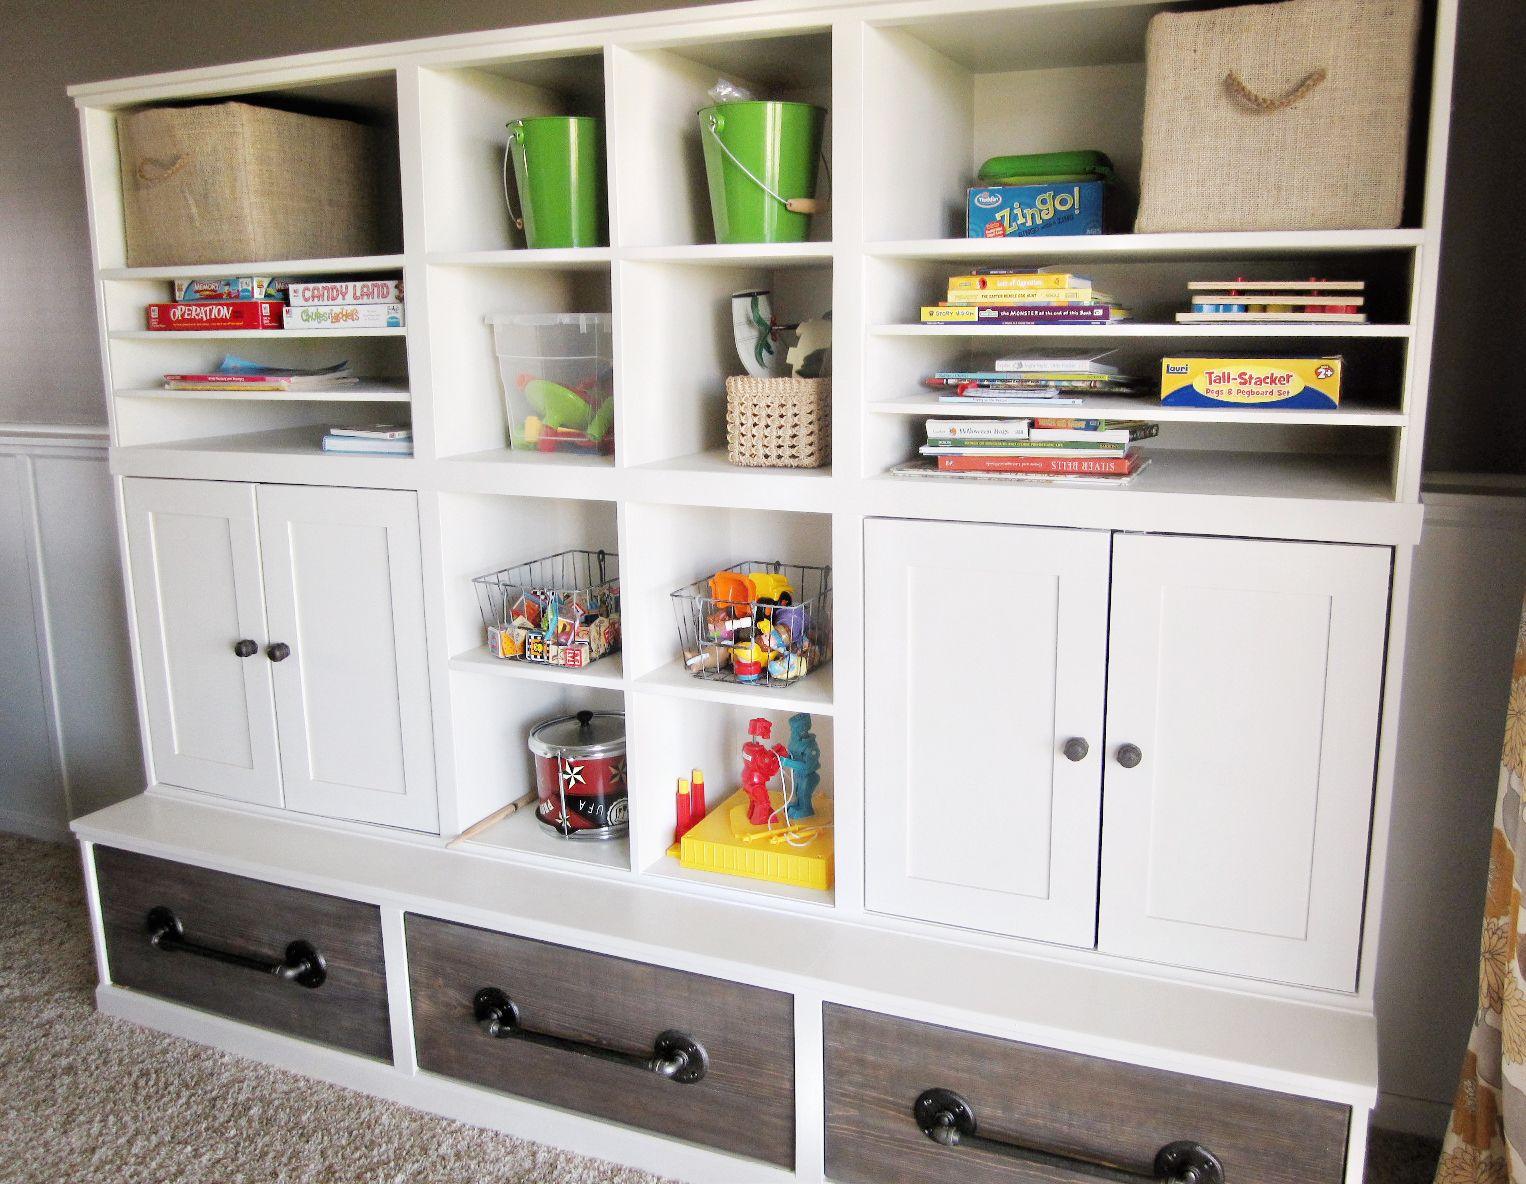 Good General, Playroom Storage Ideas: Creating A Wonderful Playroom Storage